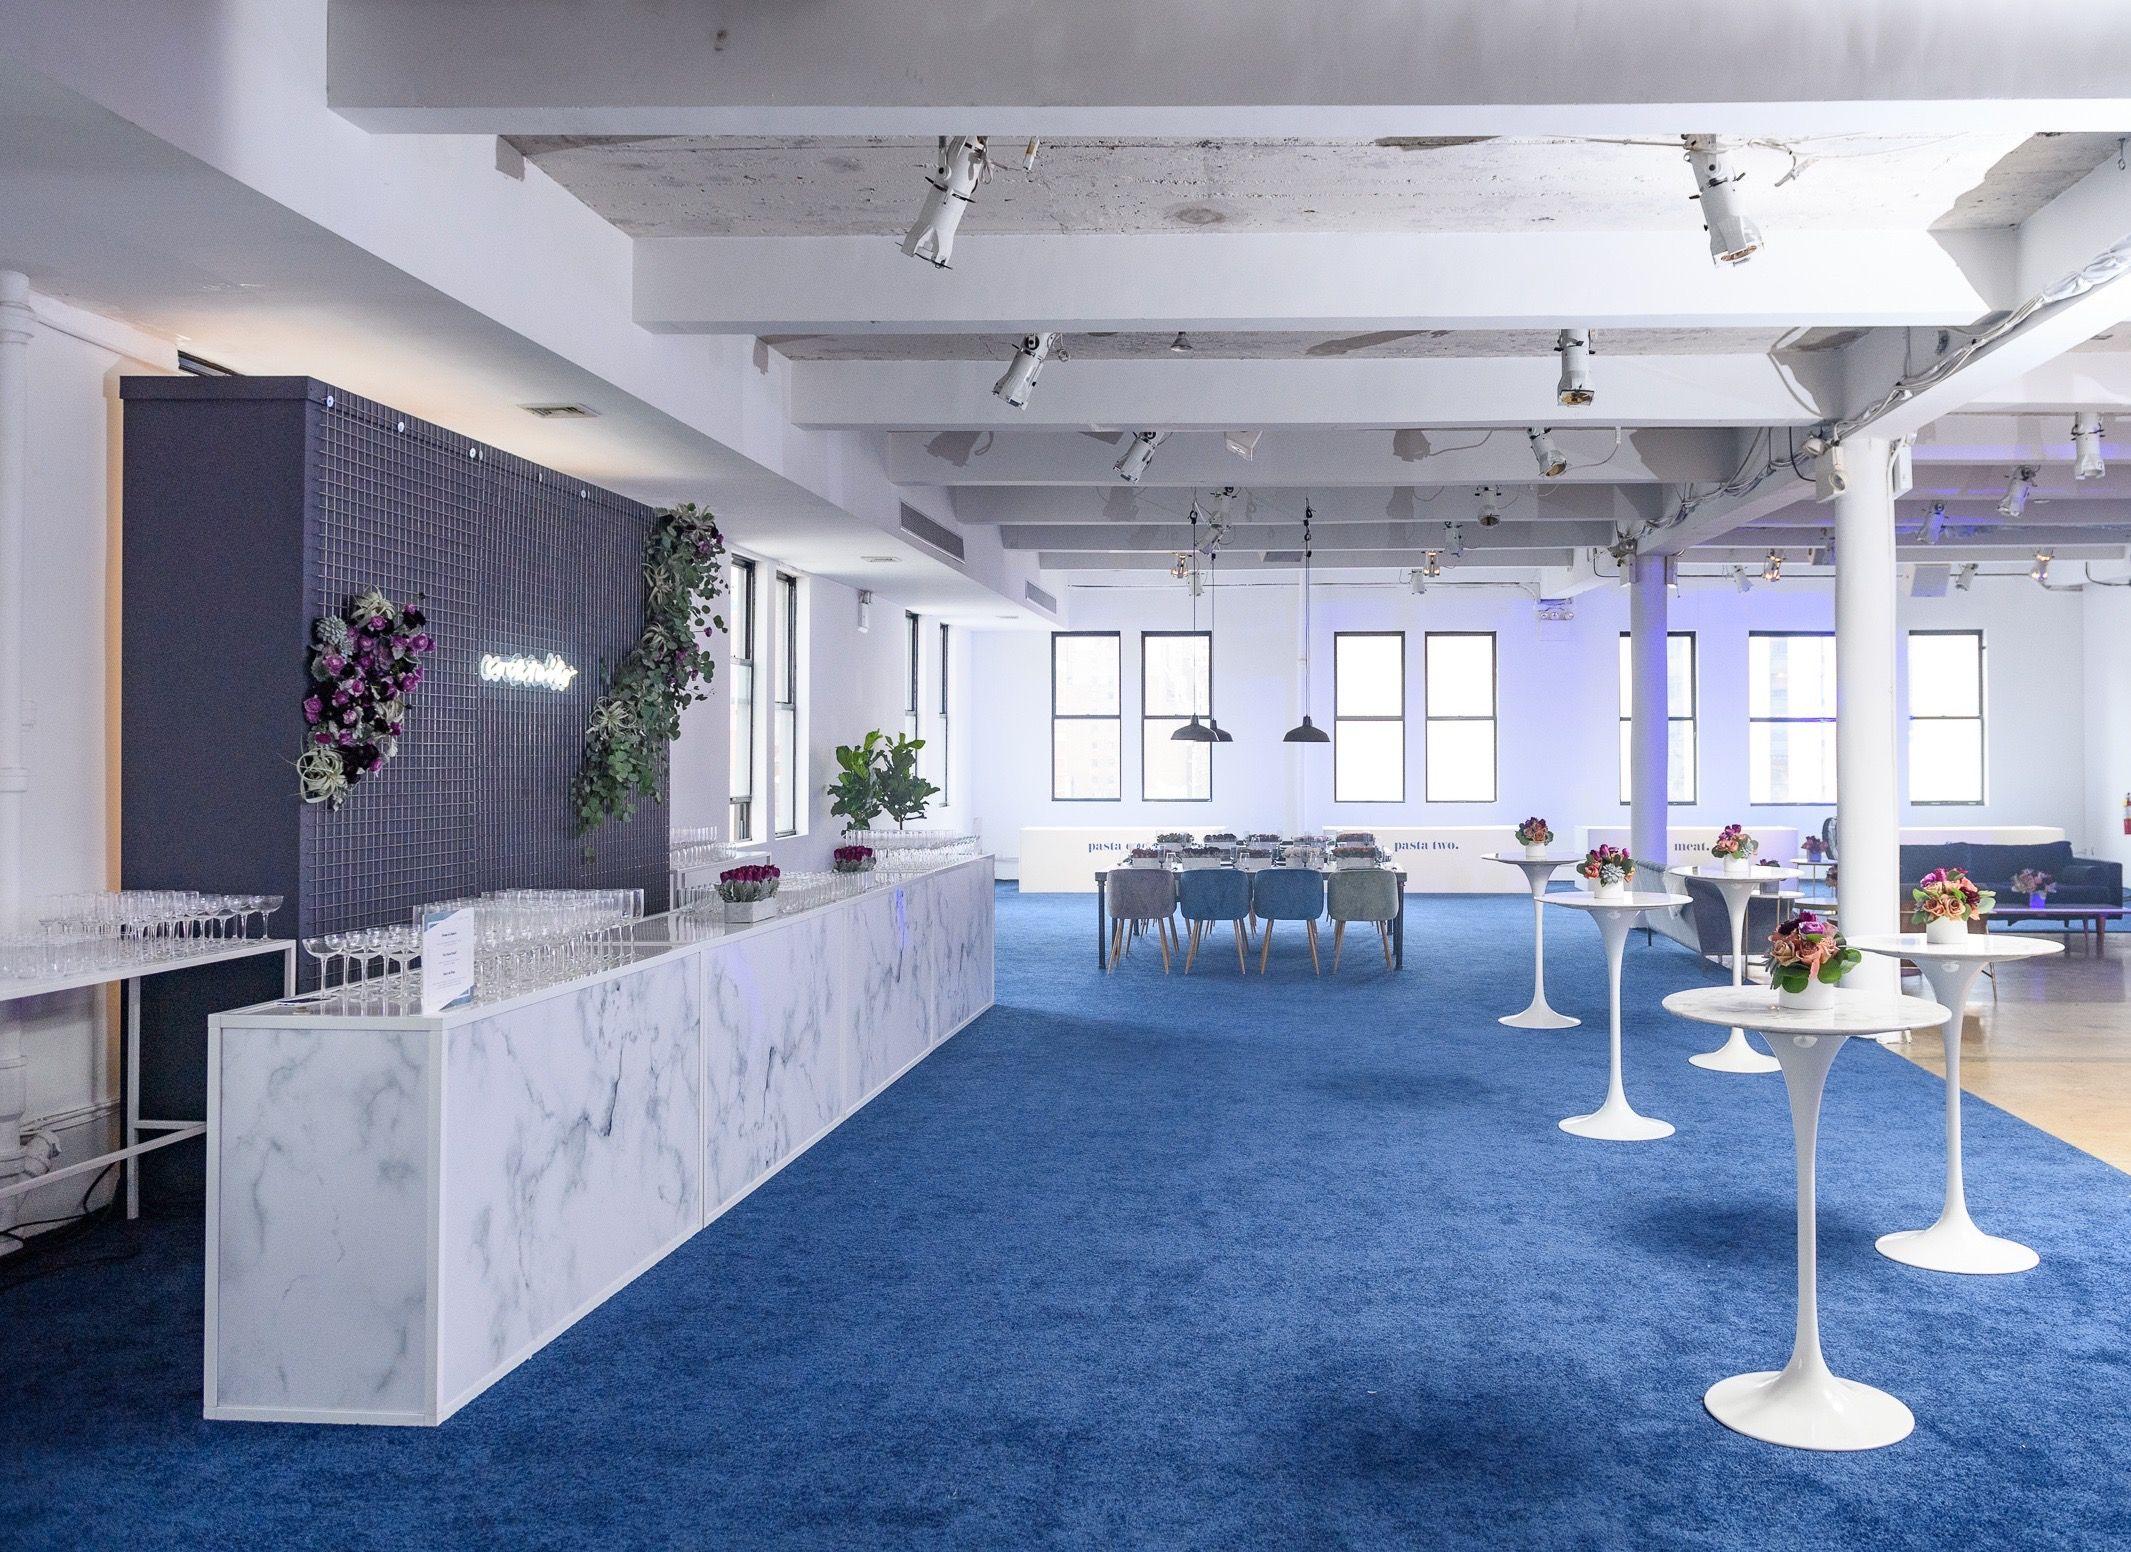 Hudson Mercantile Bestvenuesnewyork Bvny Bestvenuesny Eventspace Venue Venuefinding Venuesourcing Eventplann Event Space Event Management Outdoor Space